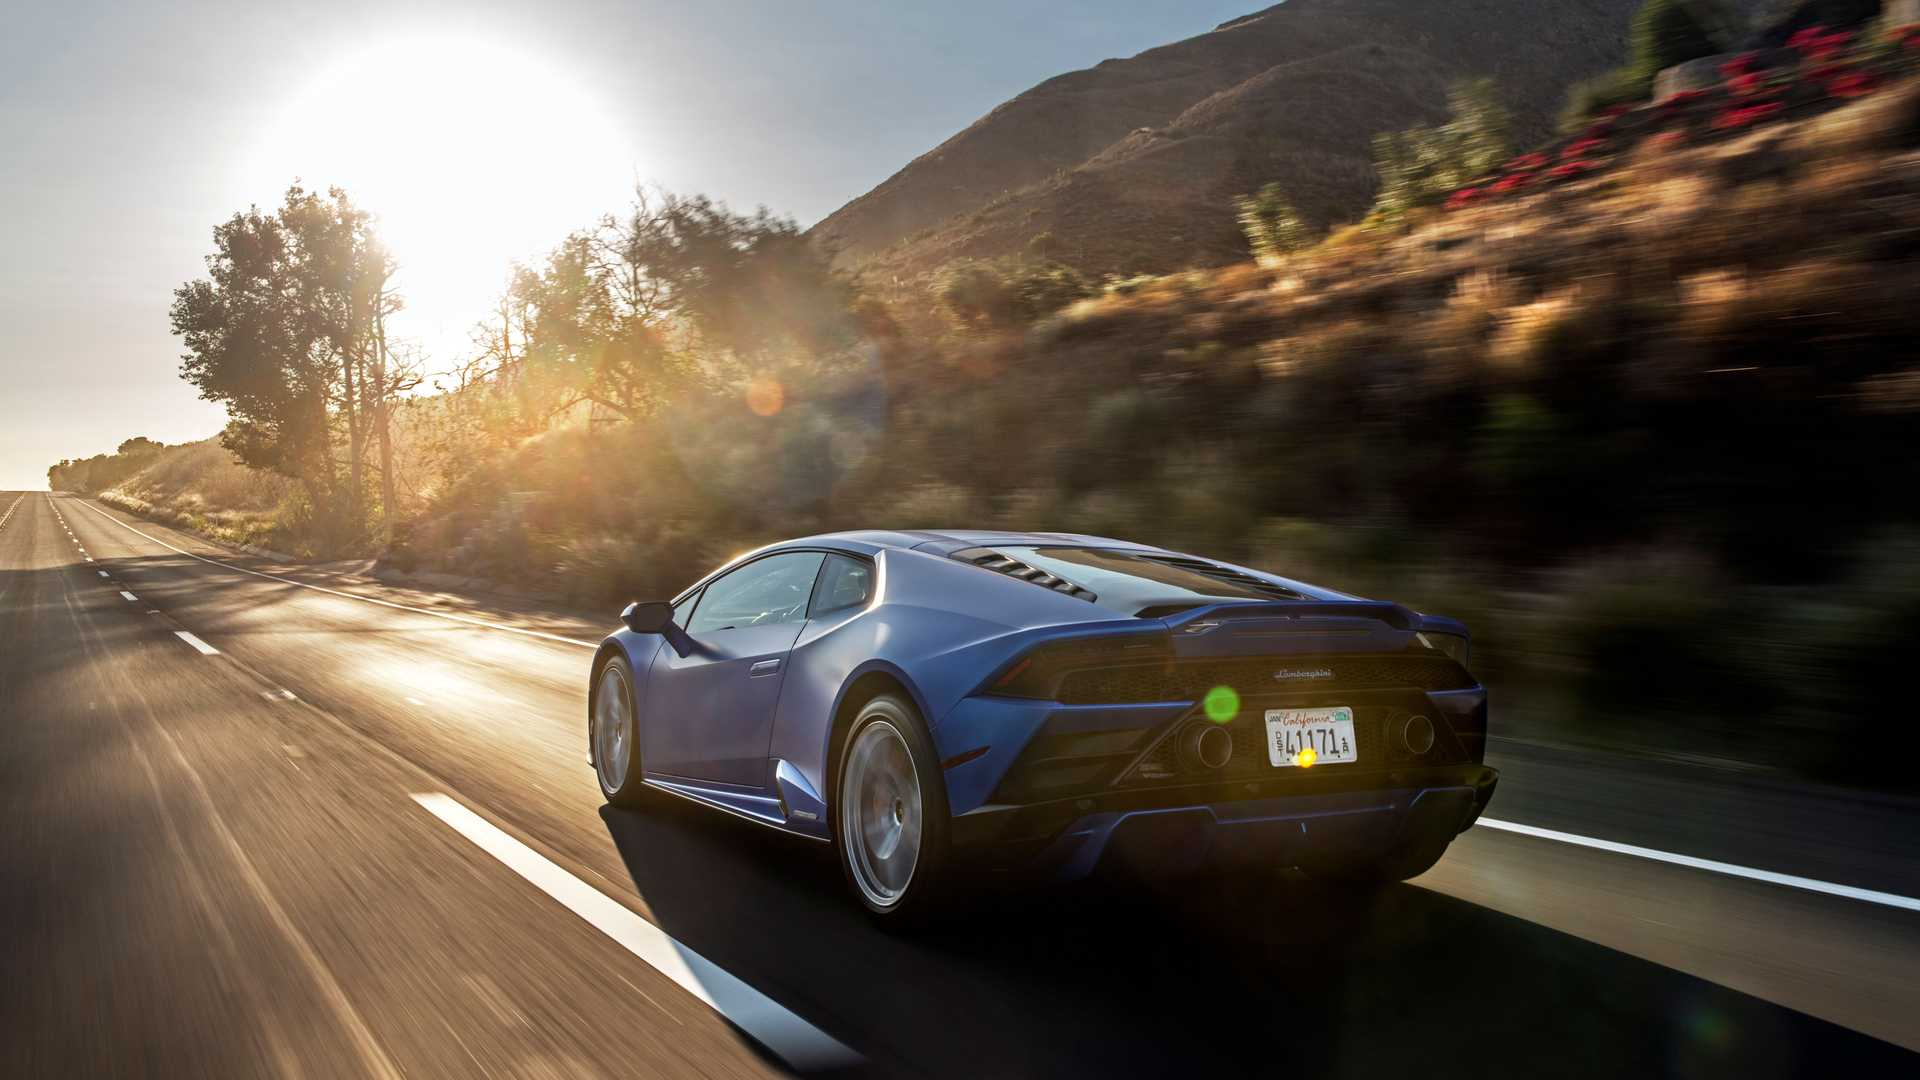 2020 Lamborghini Huracan Evo RWD rear quarter action